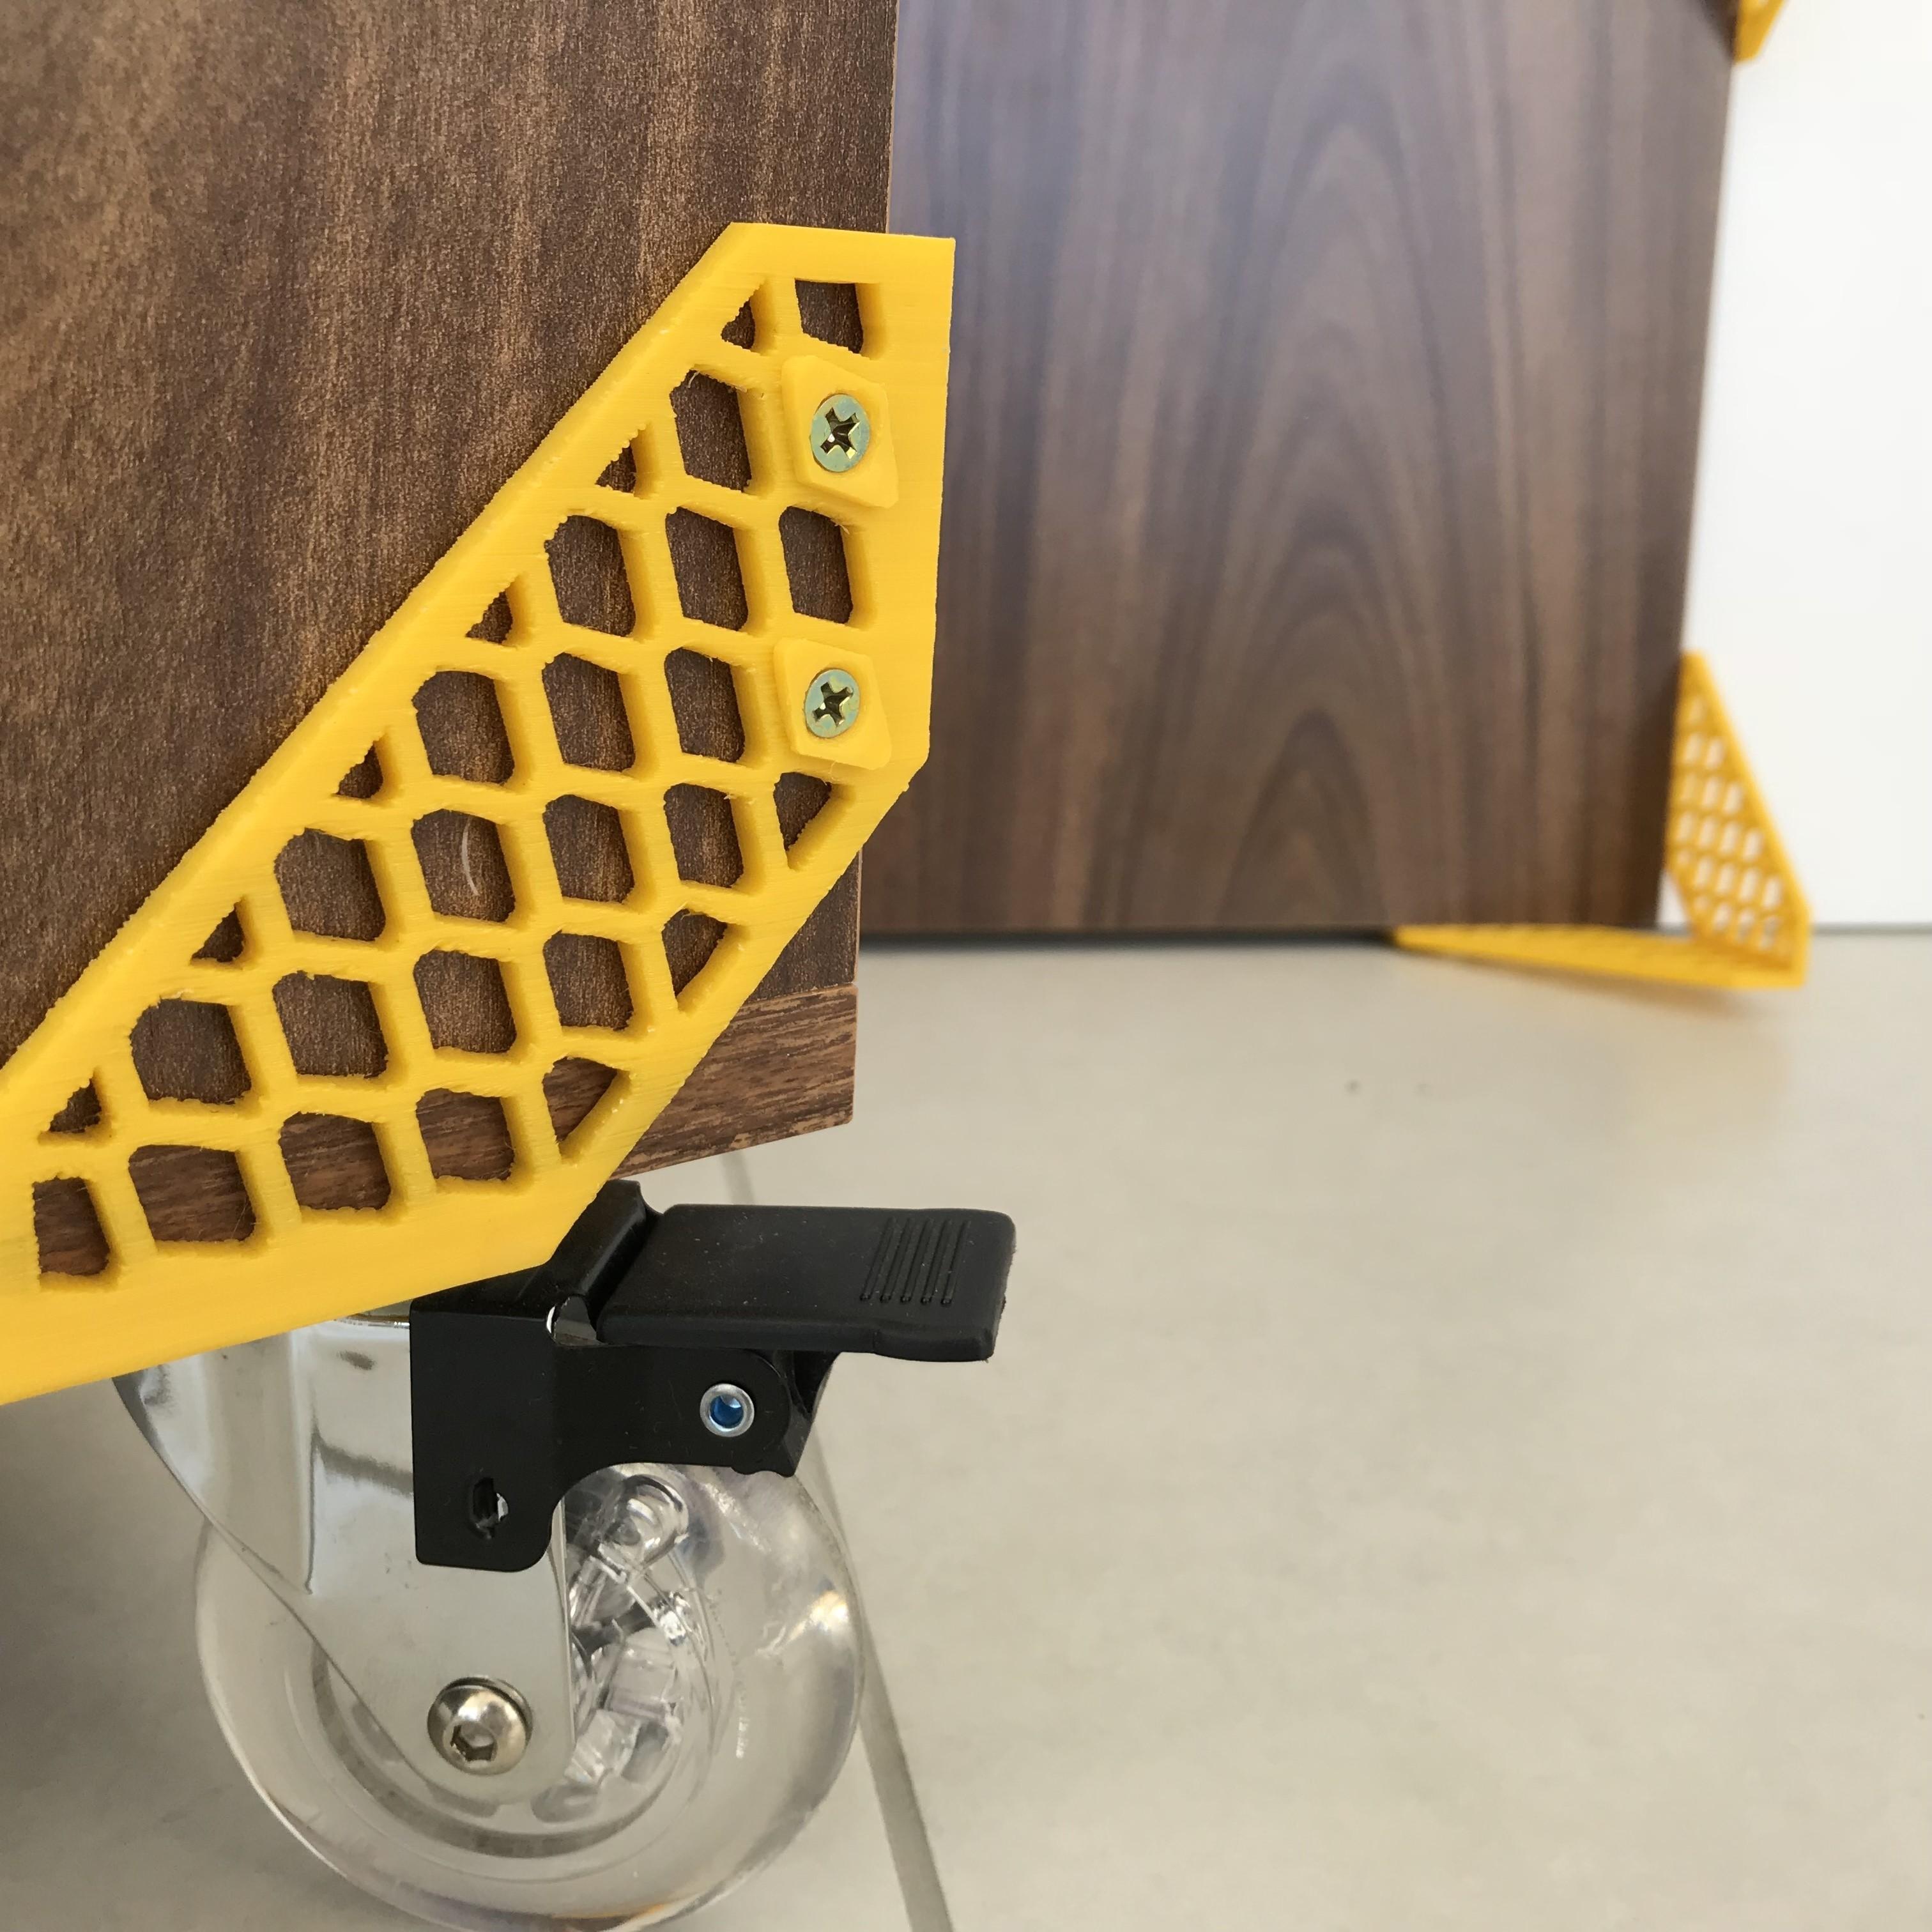 Mateus Machado_Cantoneira Trama _Print Mobi_06.JPG Download free STL file Furniture Cantoneiras Trama Print Mobi • 3D printing template, mateusmachado